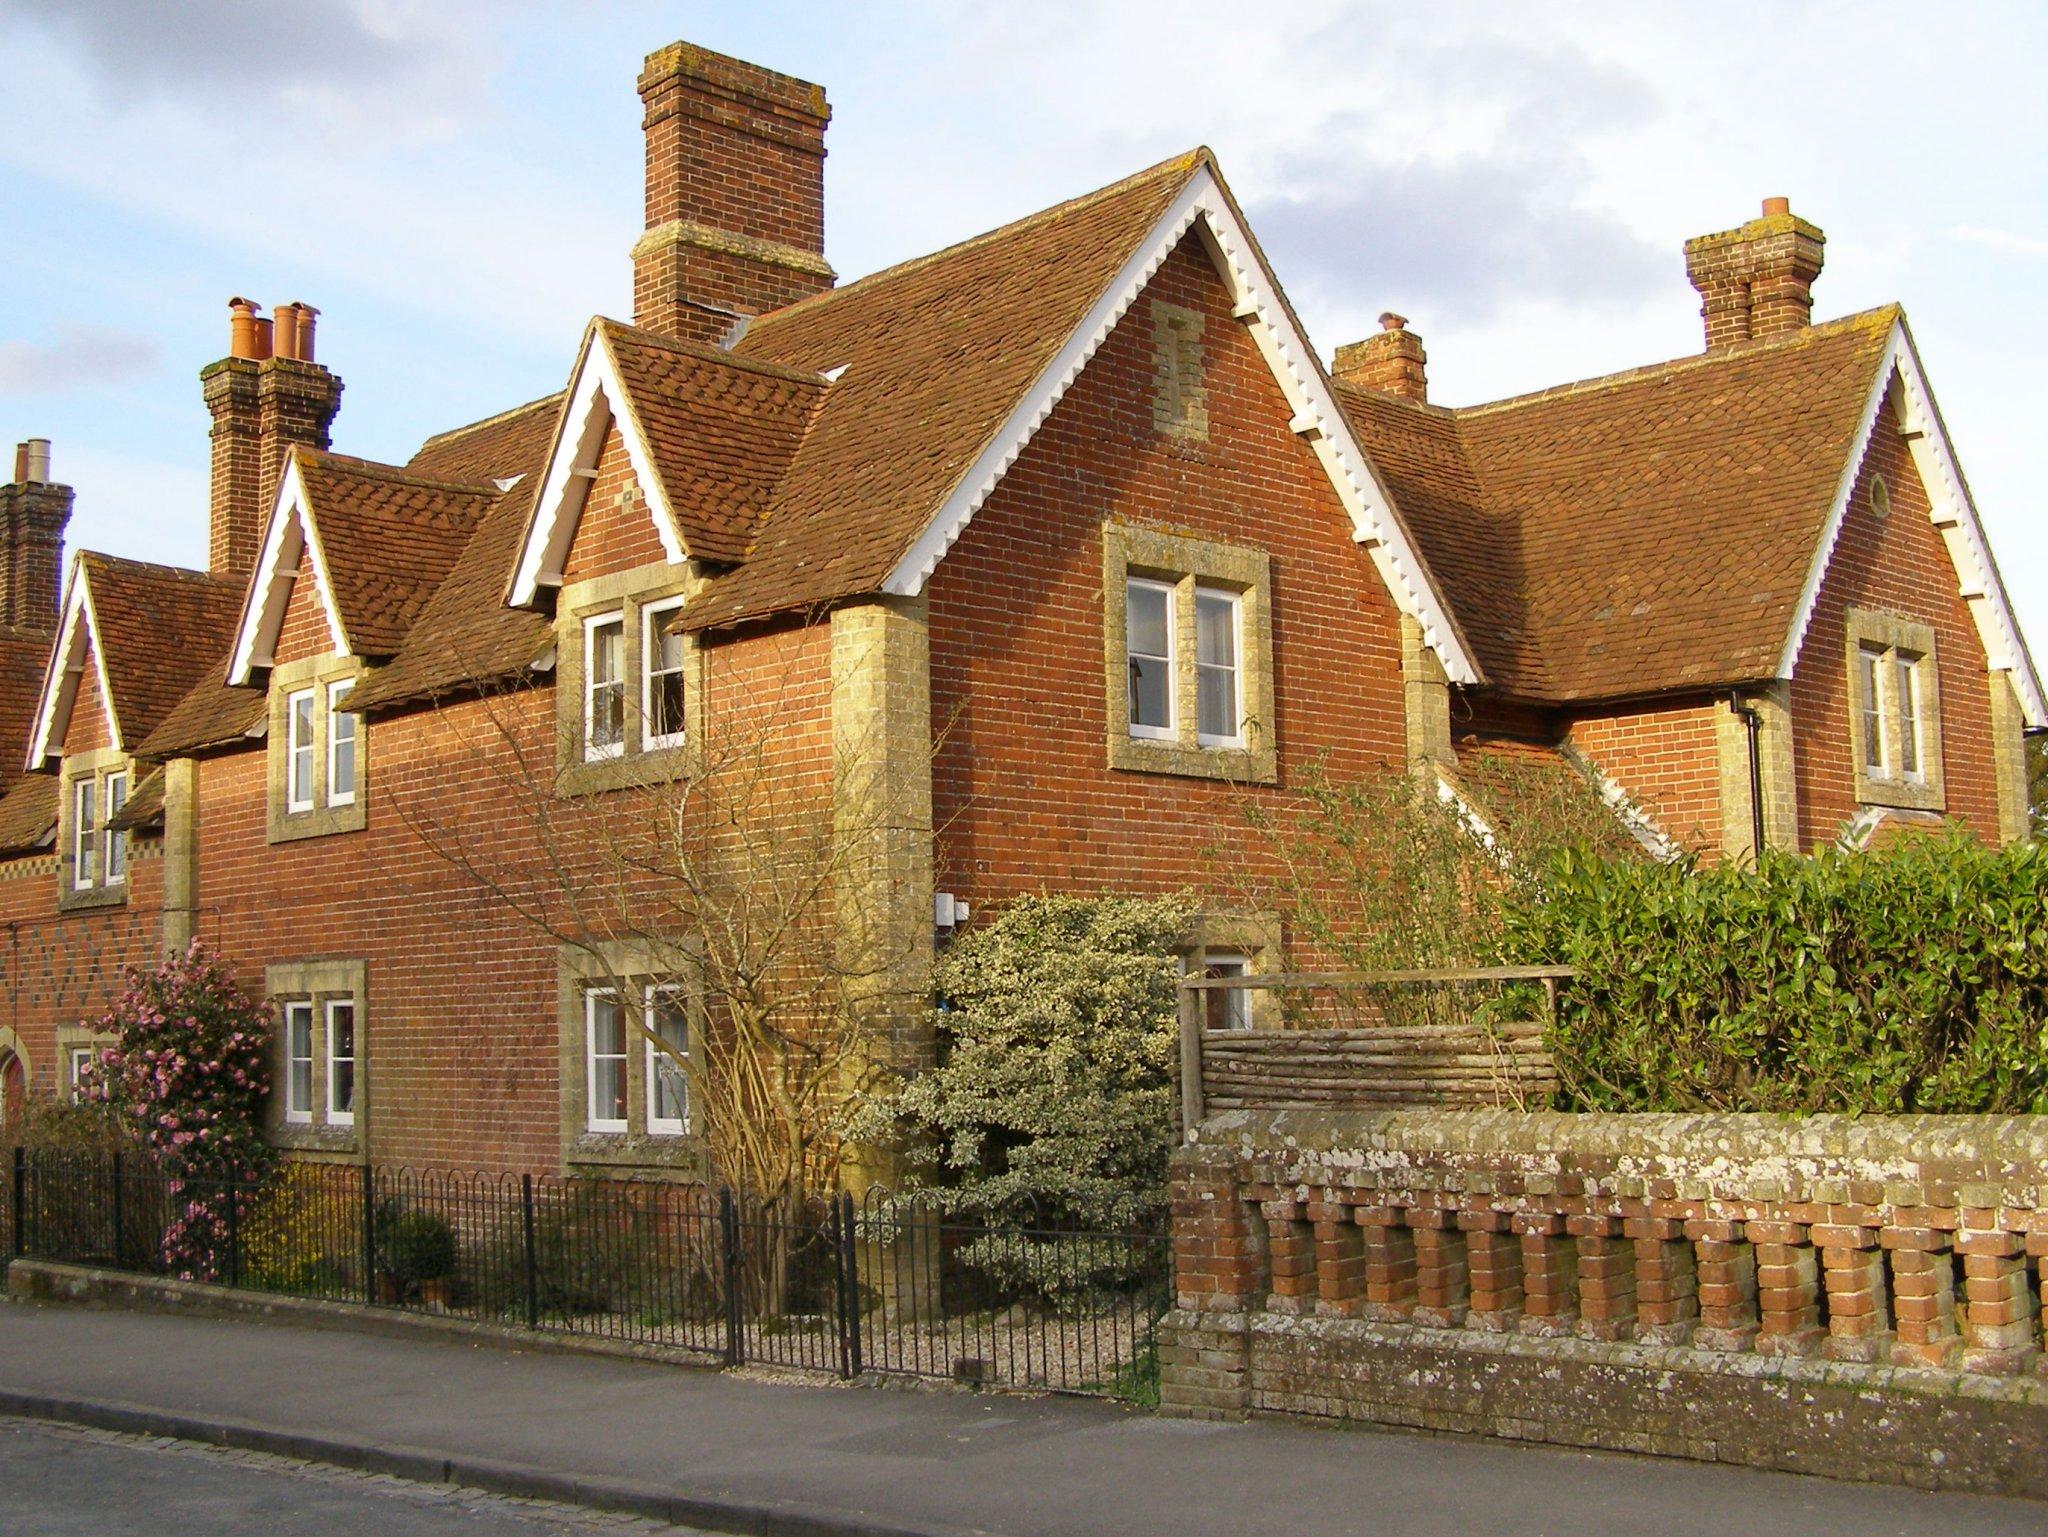 Jericho 39 s brick battlements brick house for Family cottages